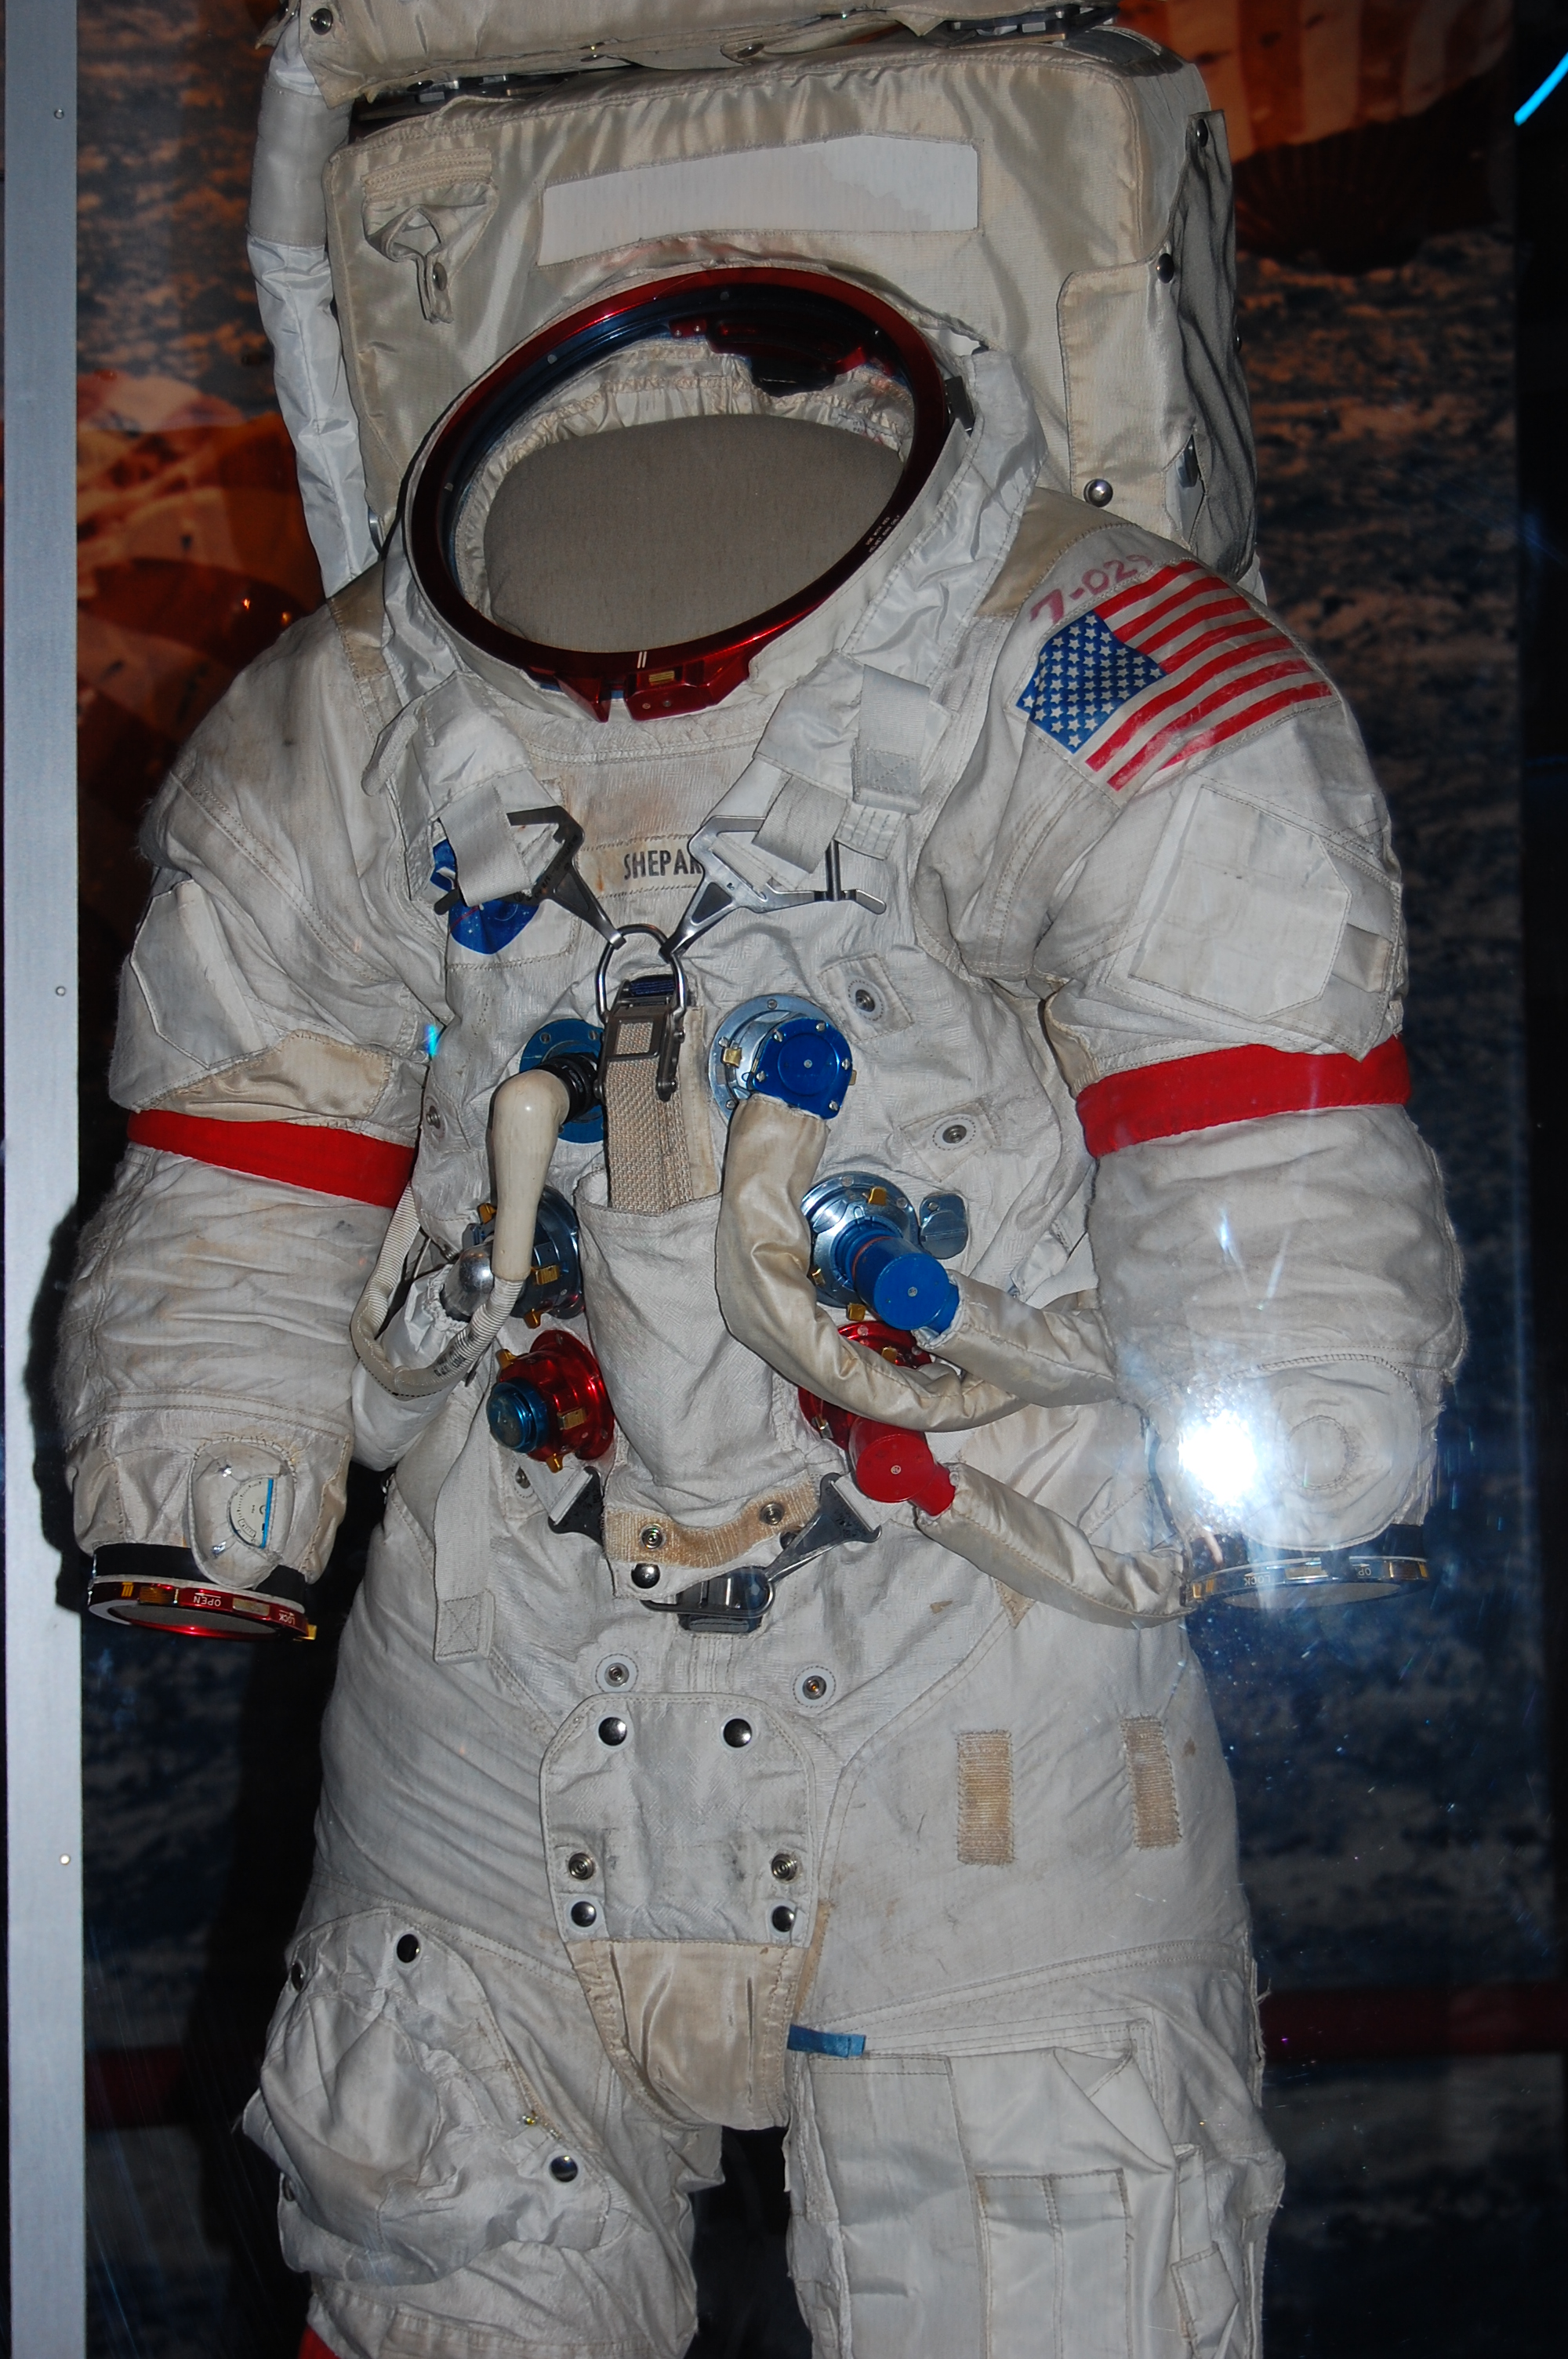 apollo 13 space suit - photo #12